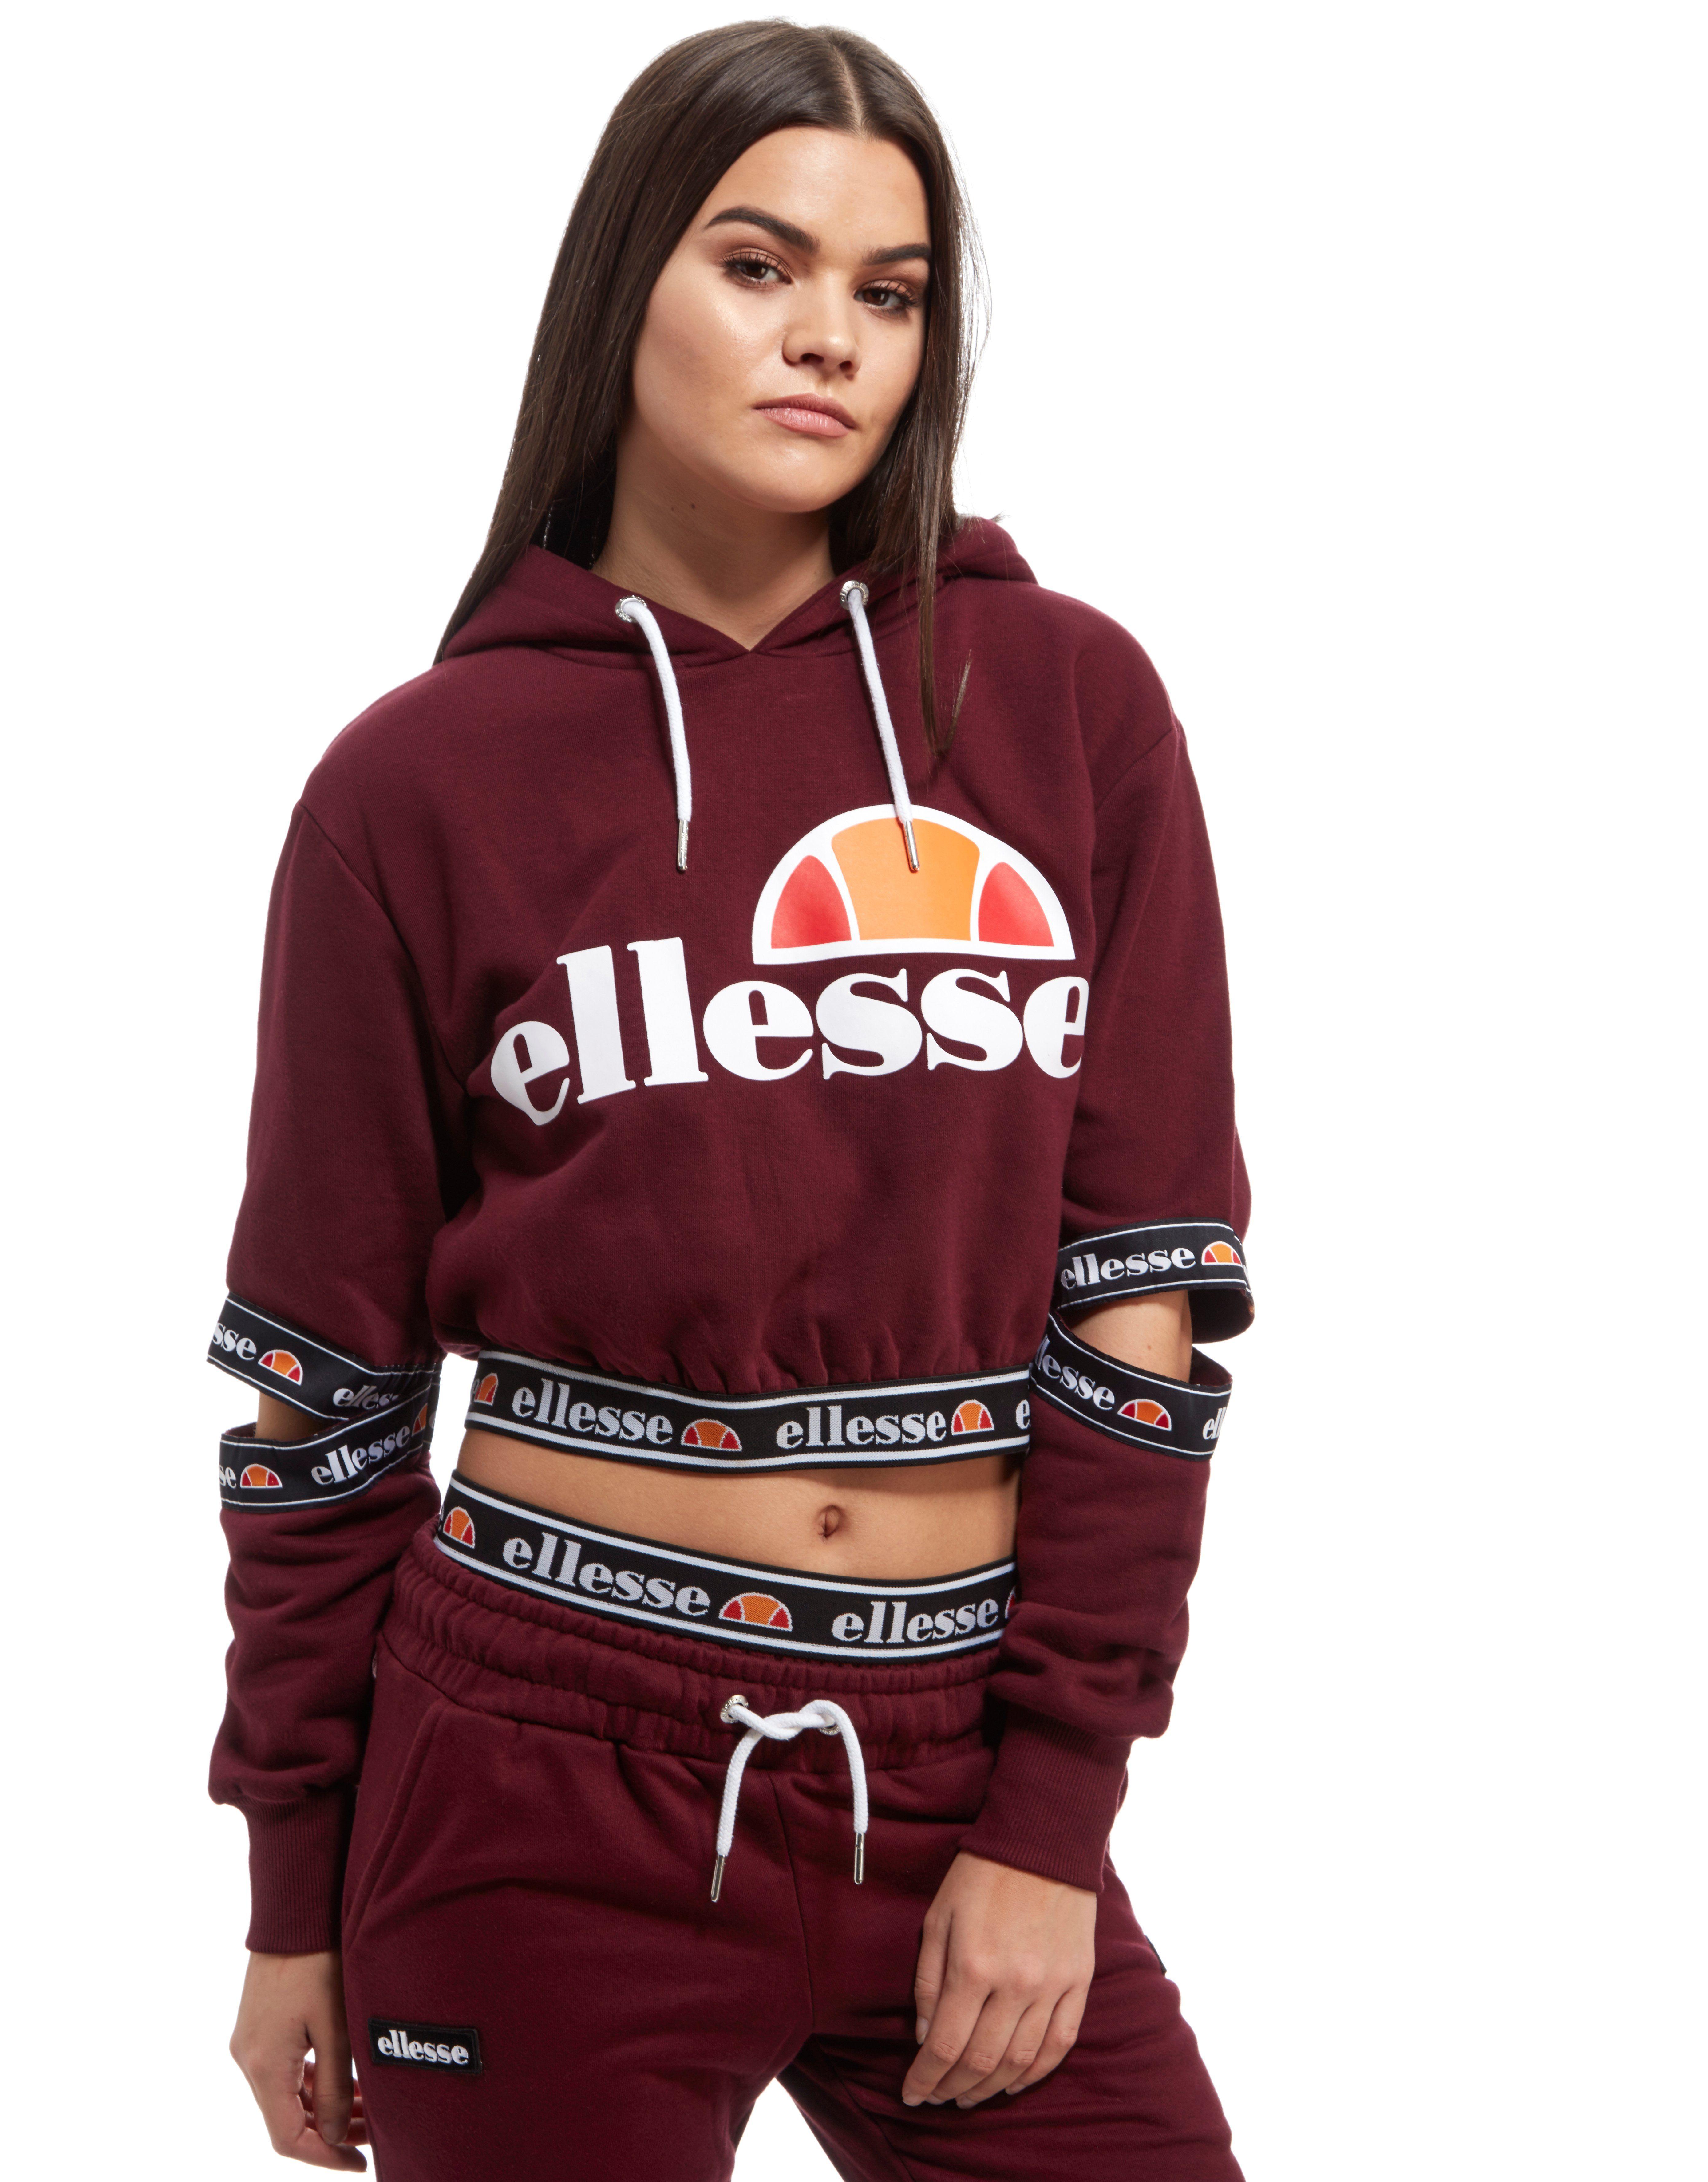 ellesse tape cut out hoodie jd sports. Black Bedroom Furniture Sets. Home Design Ideas